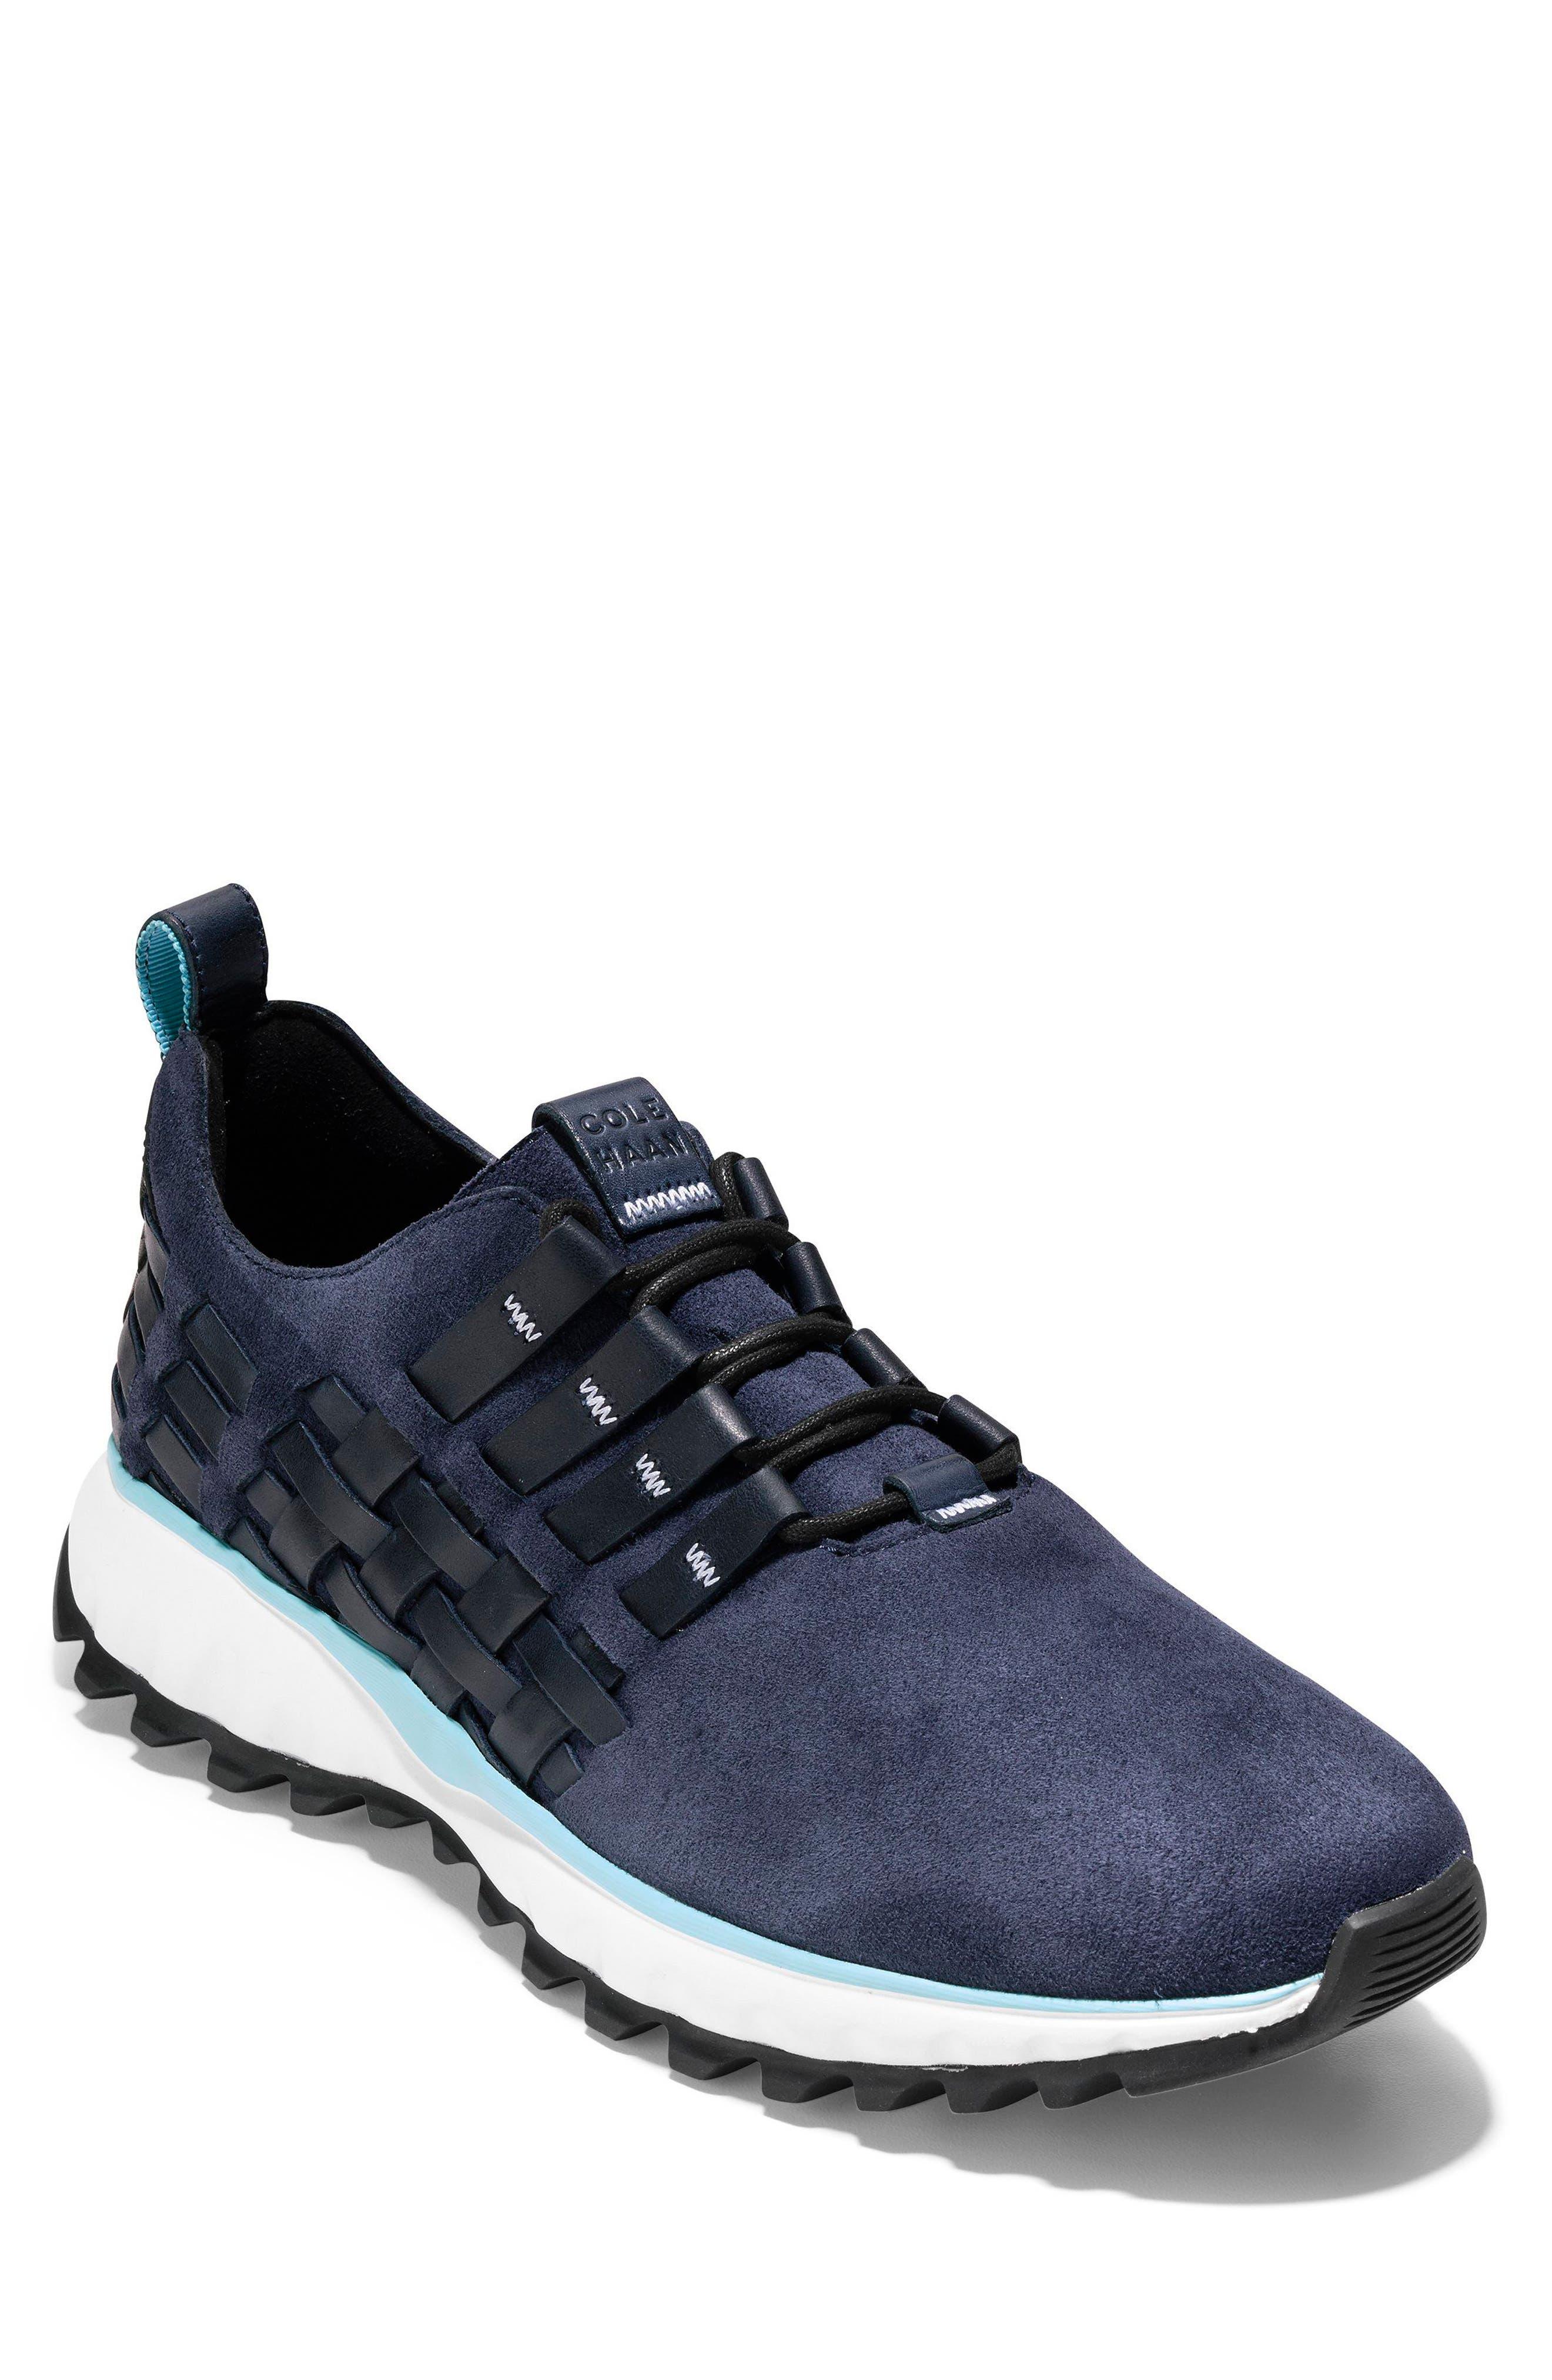 GrandExplore All Terrain Woven Sneaker,                         Main,                         color, Marine Blue/Optic White/Black